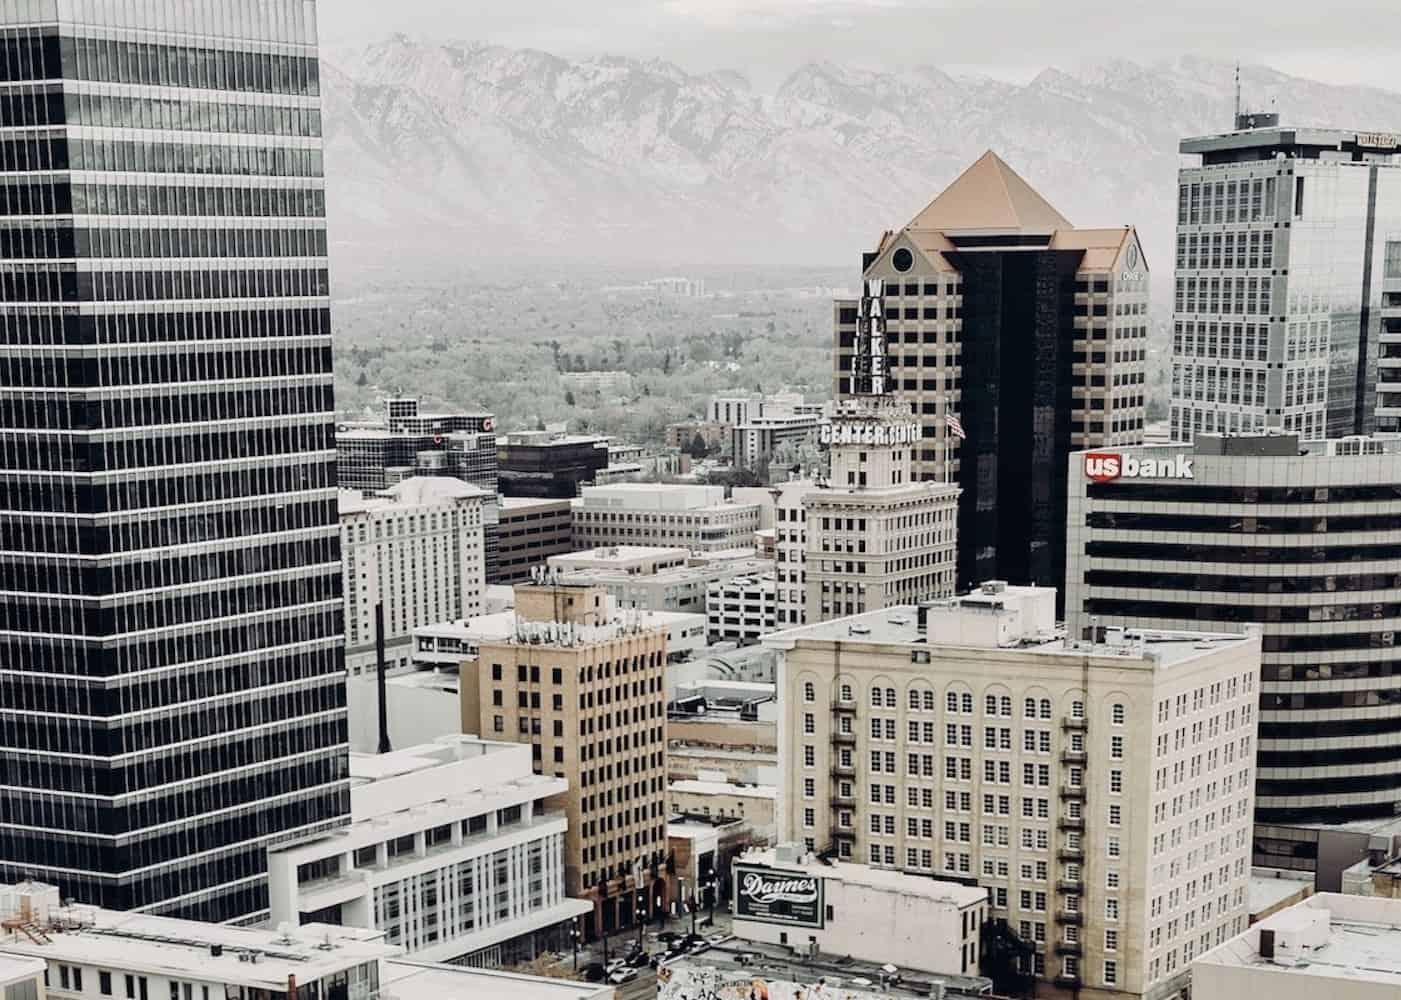 50 Fun Facts About Salt Lake City | ApartmentGuide.com